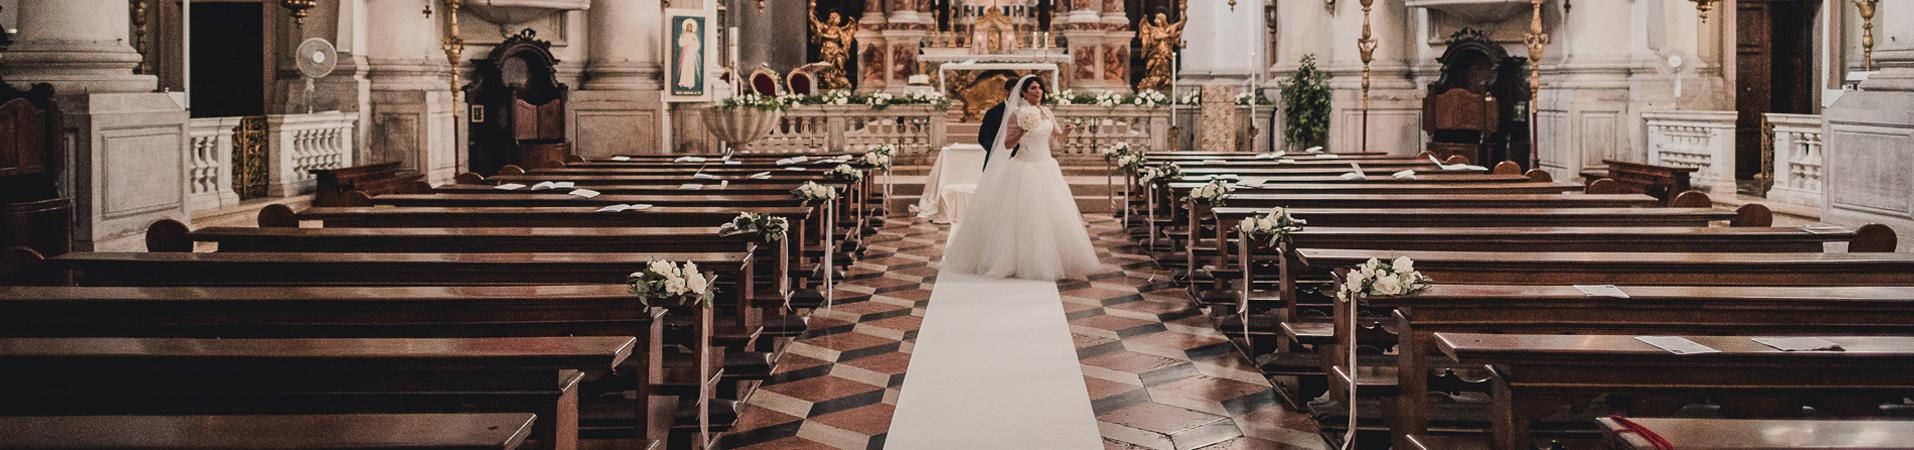 wedding_planner_venezia_chiese_